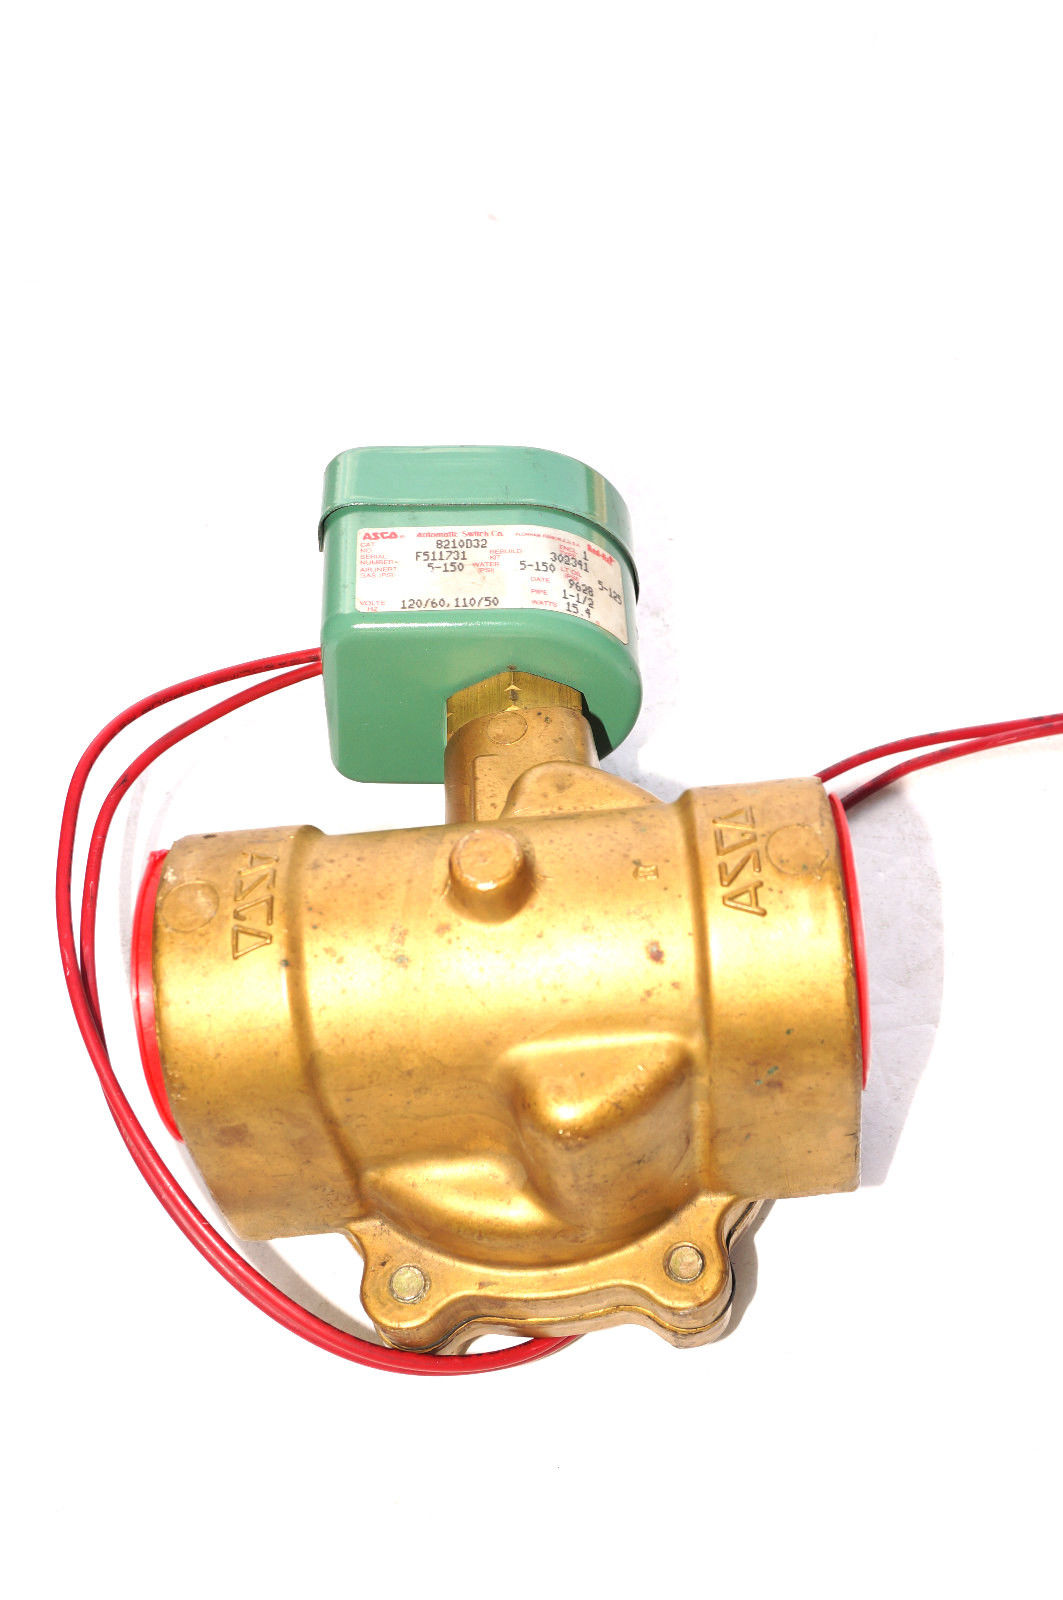 asco solenoid valve 8210 wiring diagram 2006 jetta sb industrial supply mro plc equipment parts